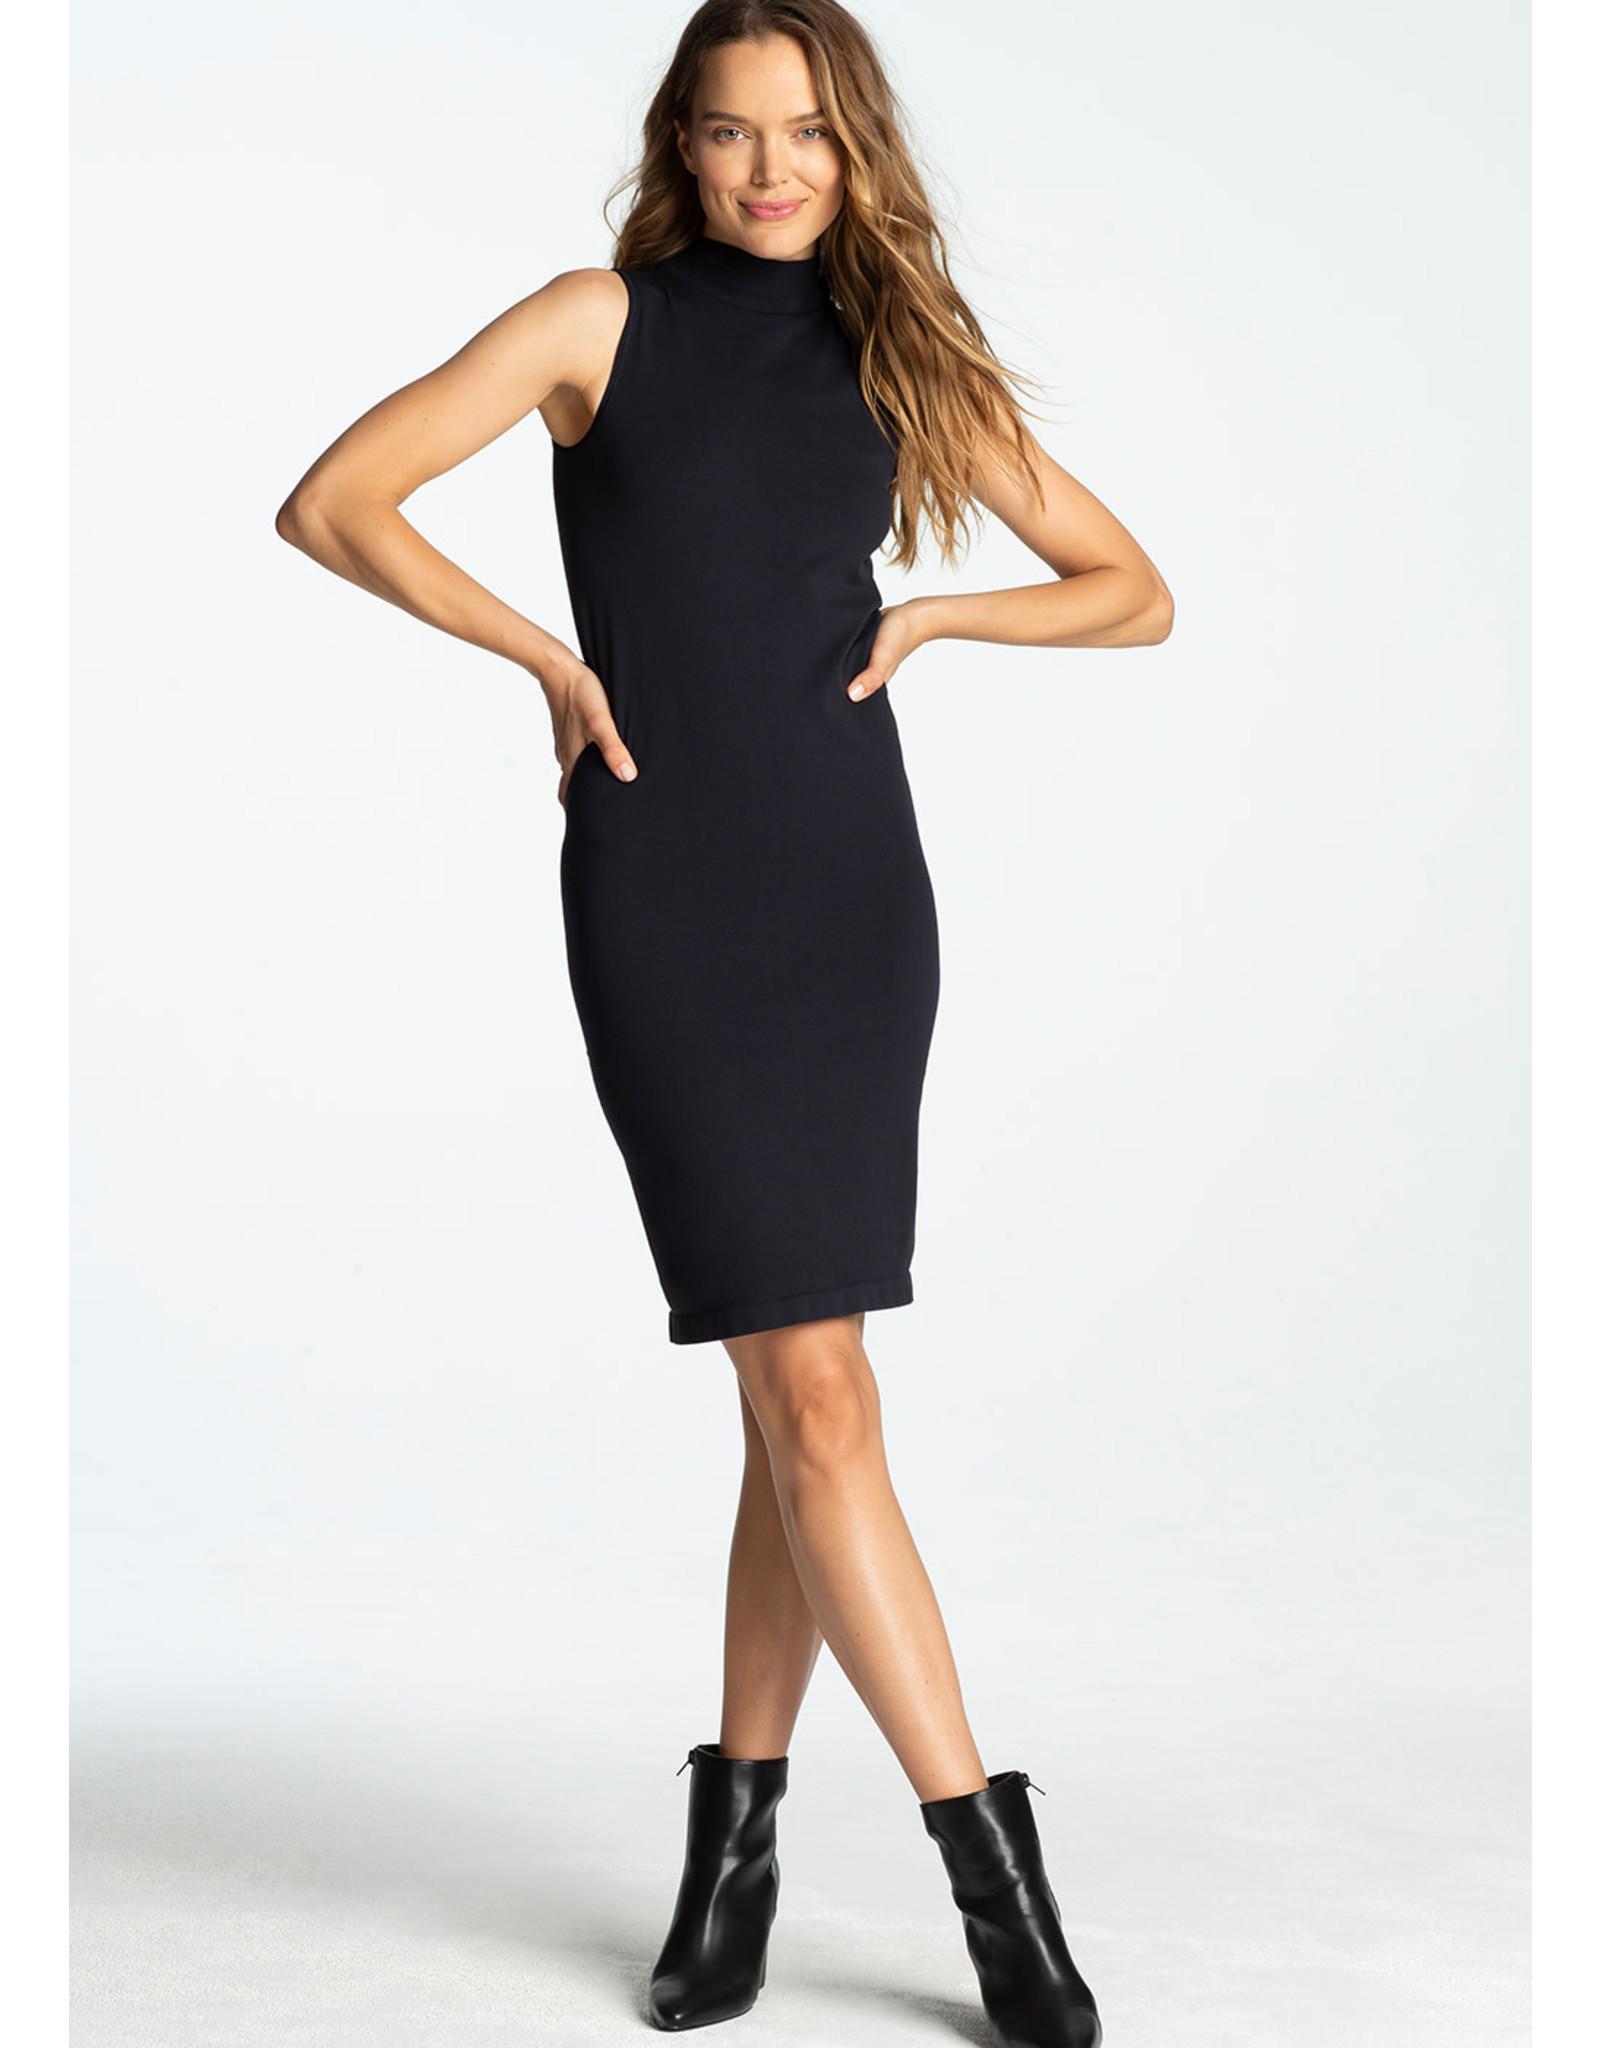 Yummie Yummie Smoothing Mock Neck Dress